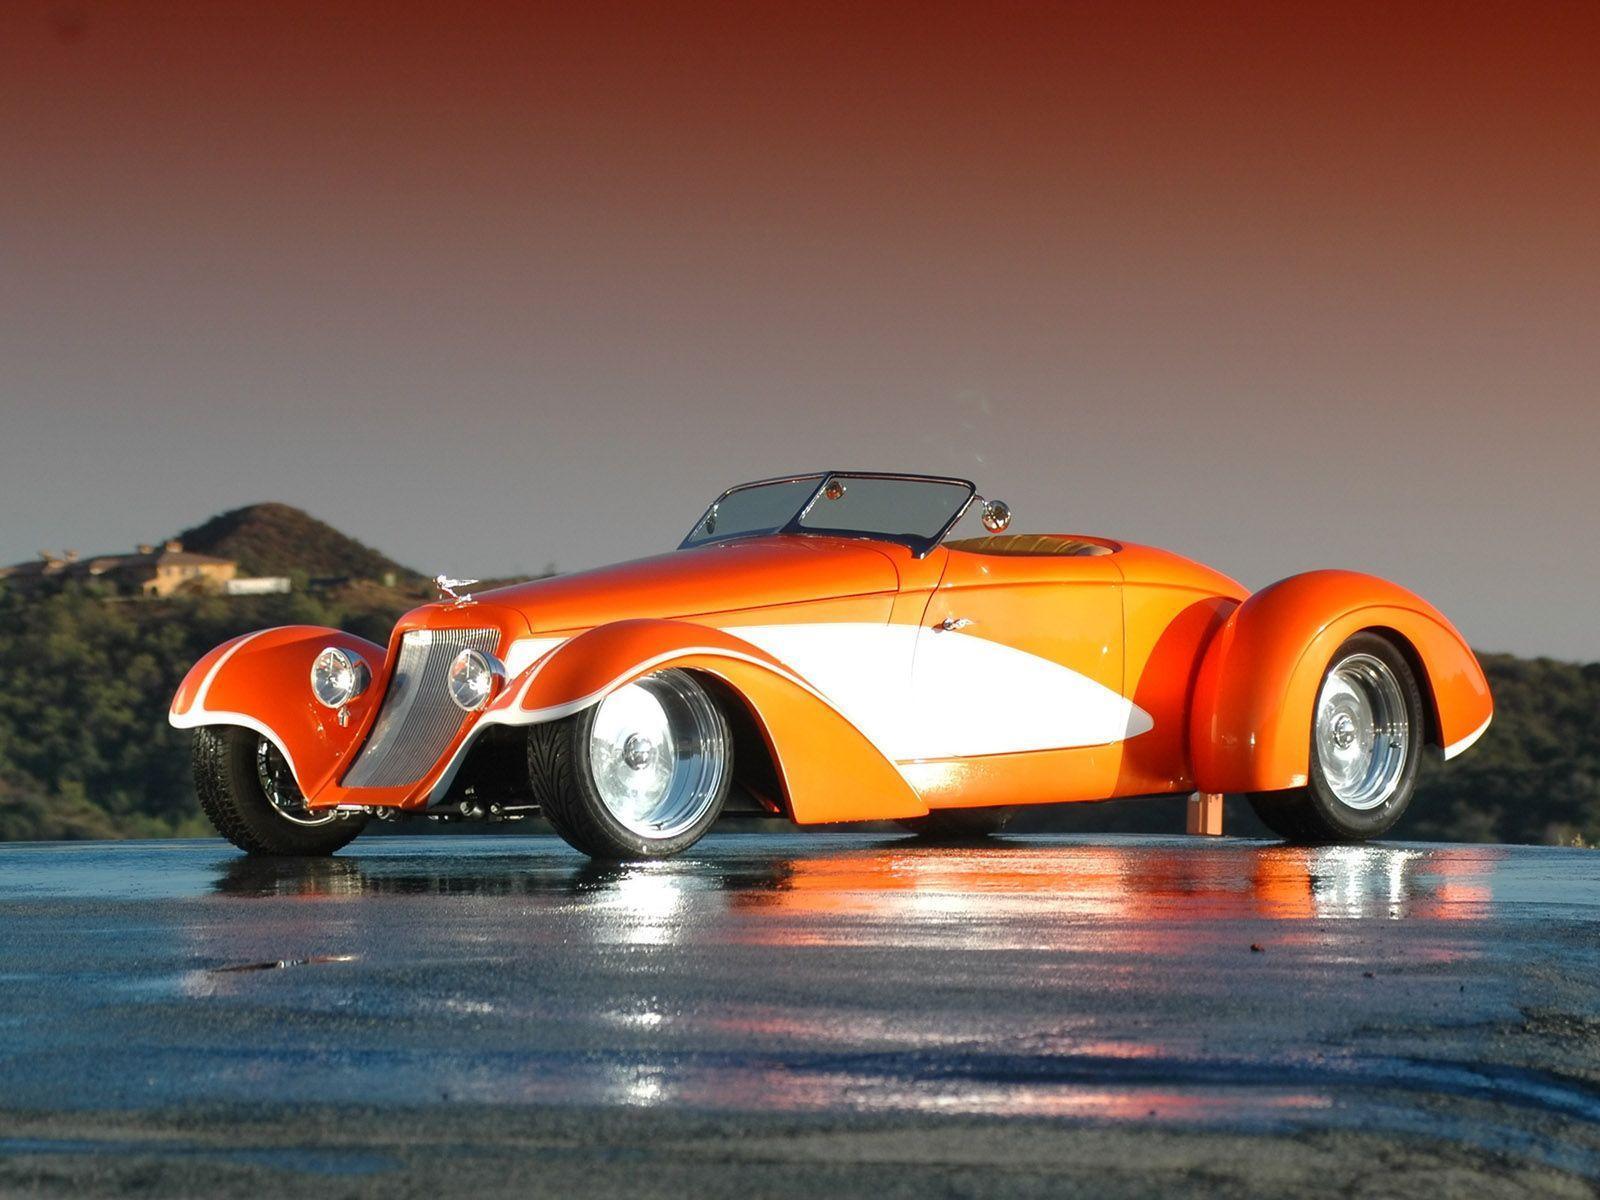 chip foose custom cars wallpapers - photo #20